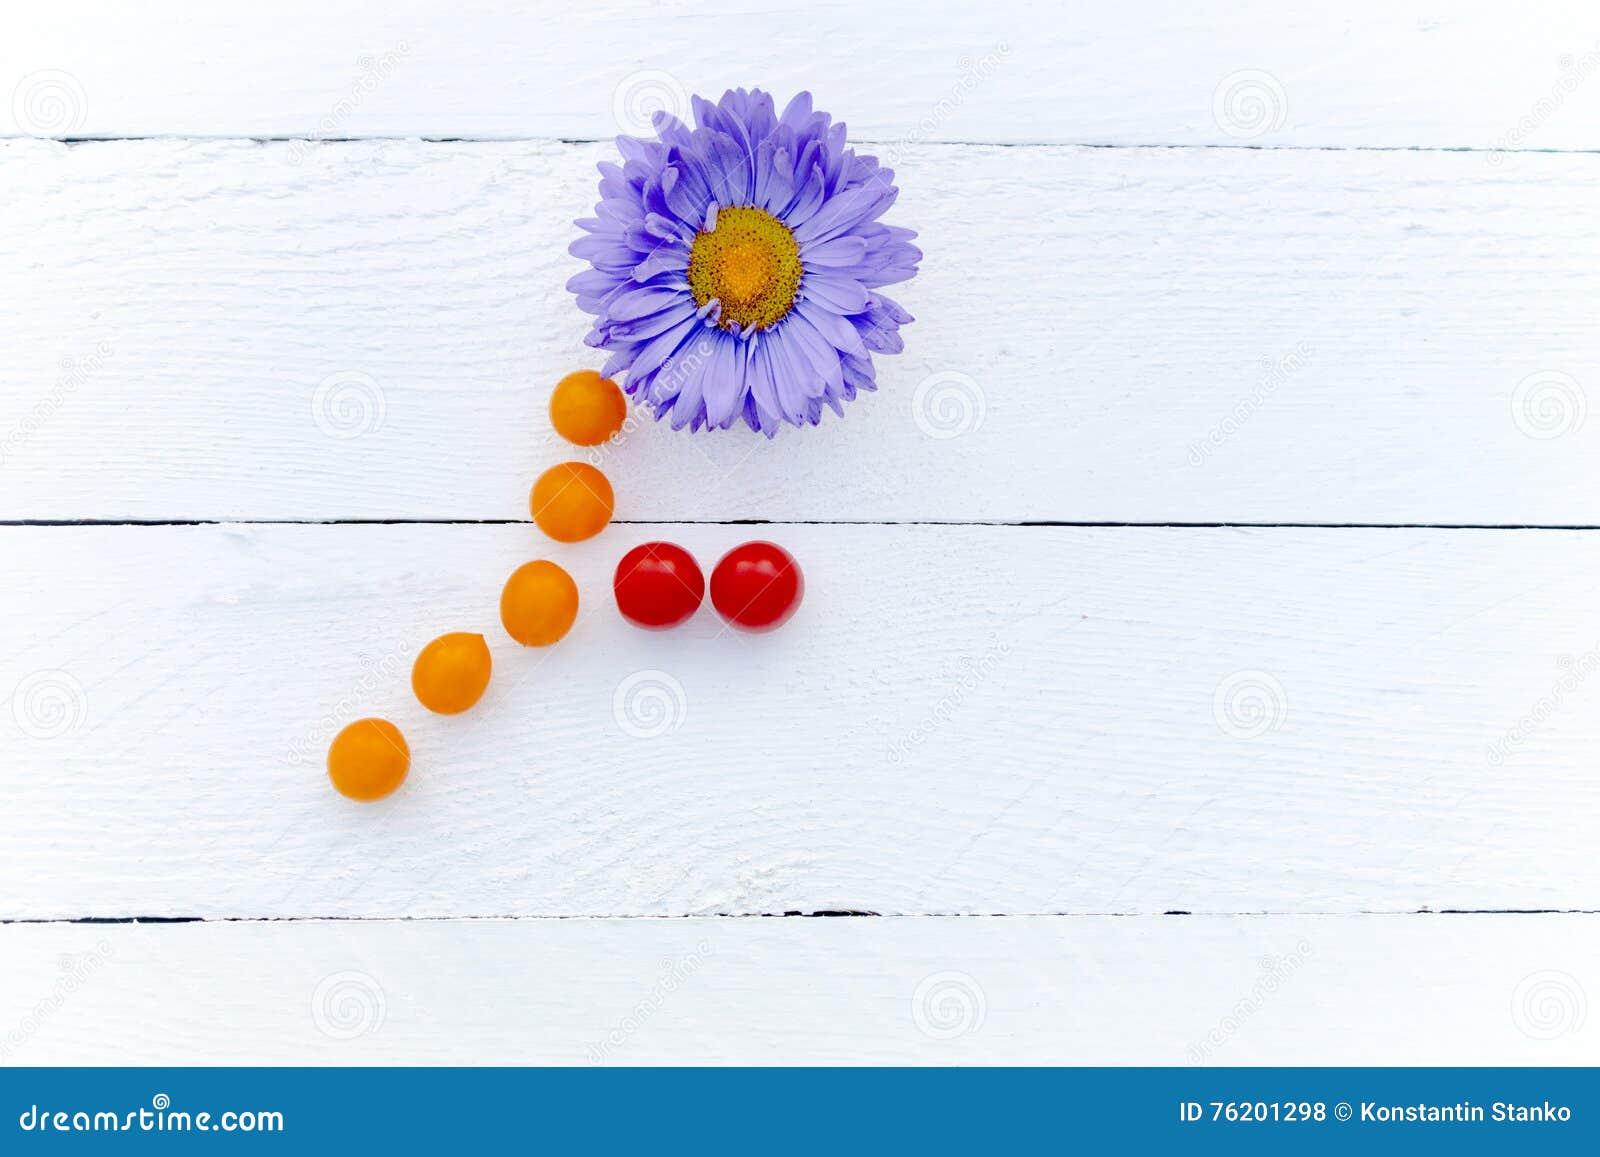 Violet Chrysanthemum-stam en bladeren van kersentomaten